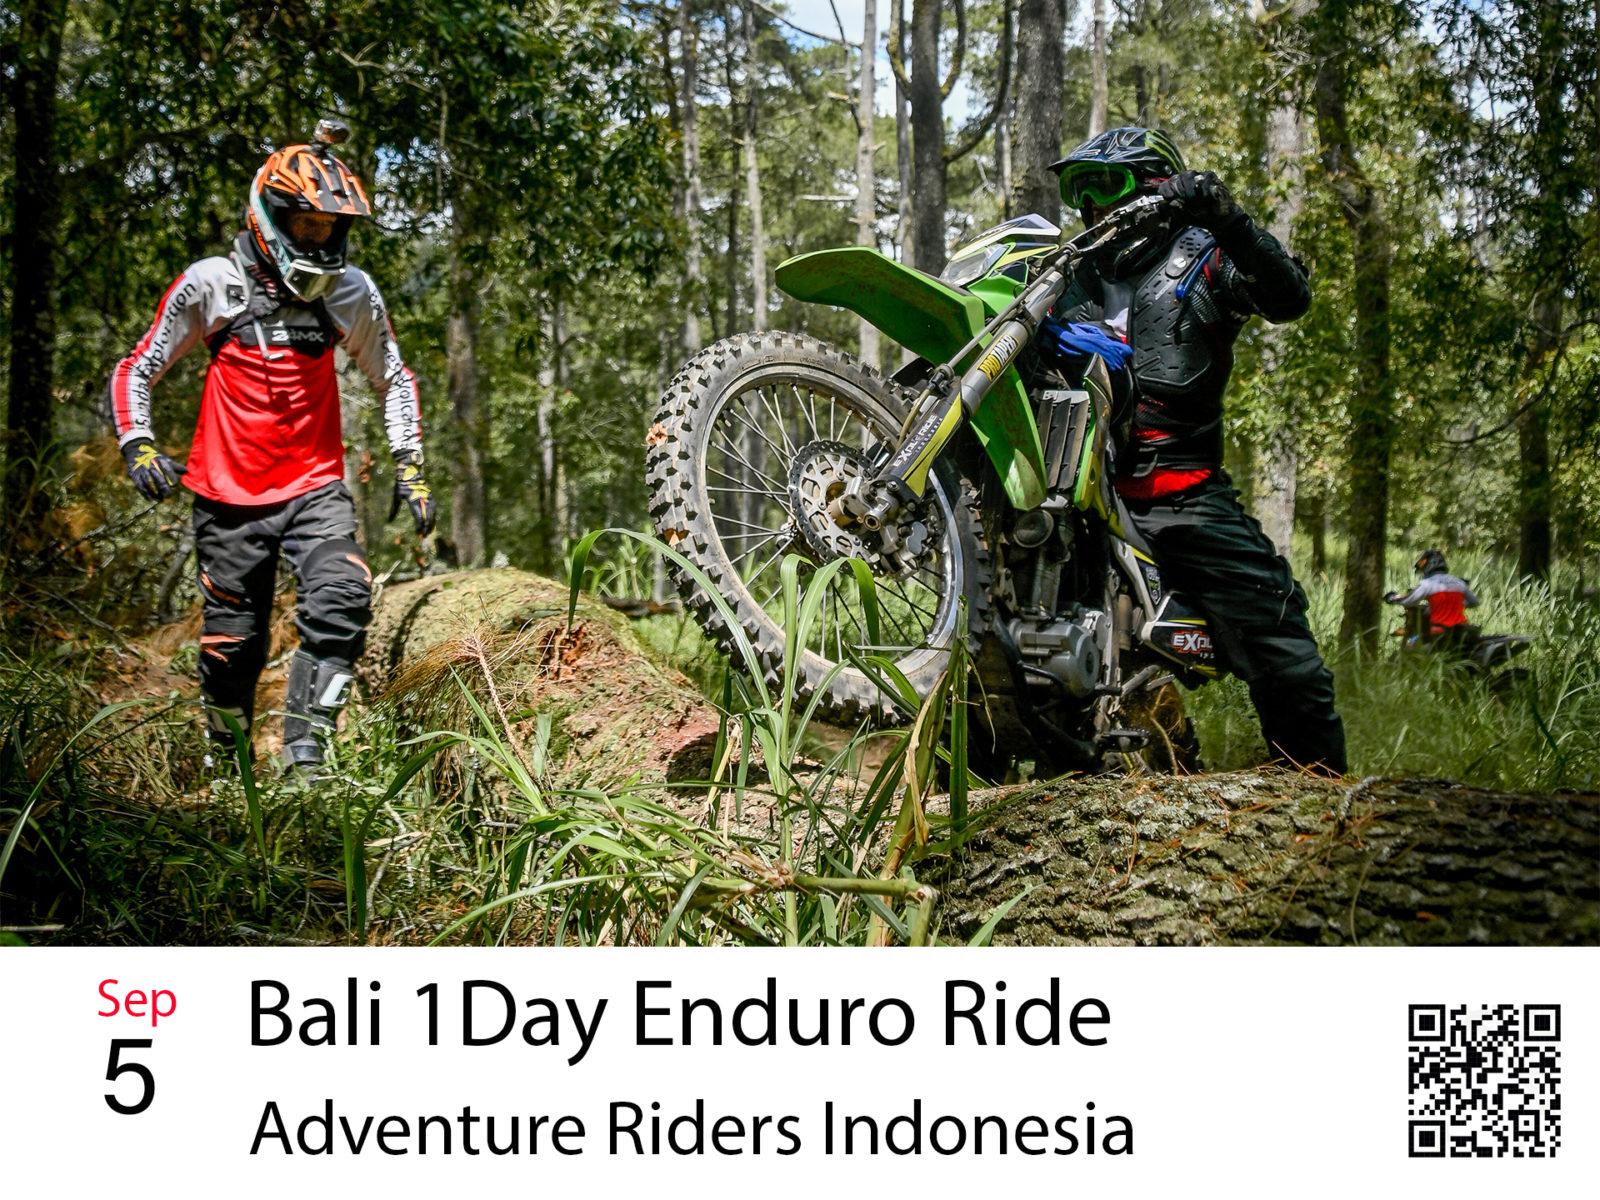 Bali Enduro Ride | Dirt Bike Bali